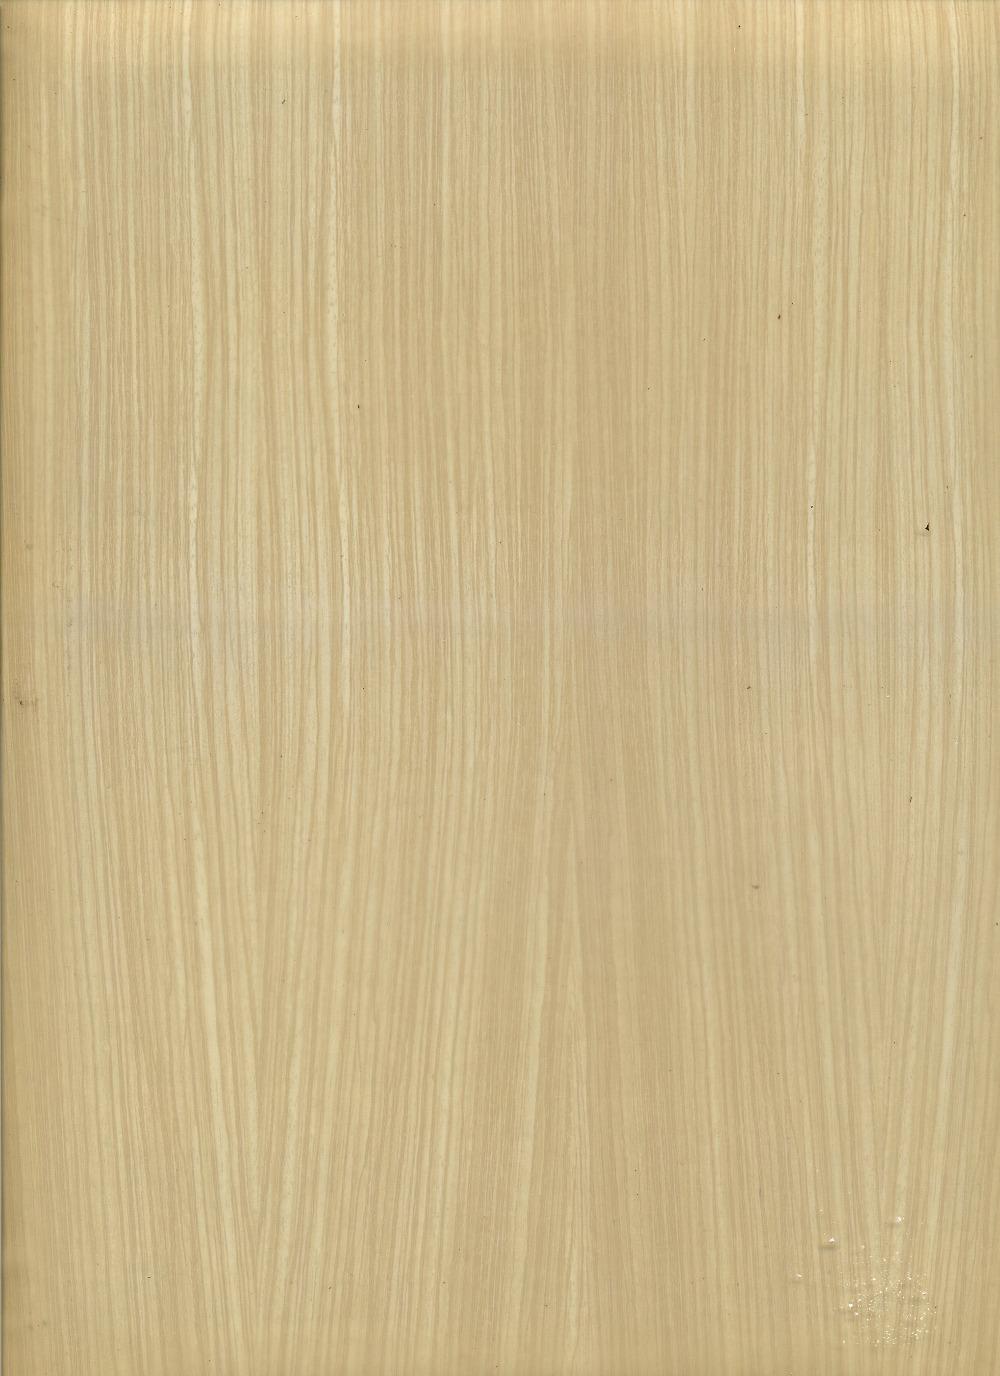 Hydrographics Film for Sale Light Oak No.M-8404 Width1m Length 10m Hydro Dip Kits Hydro Printing Film(China (Mainland))